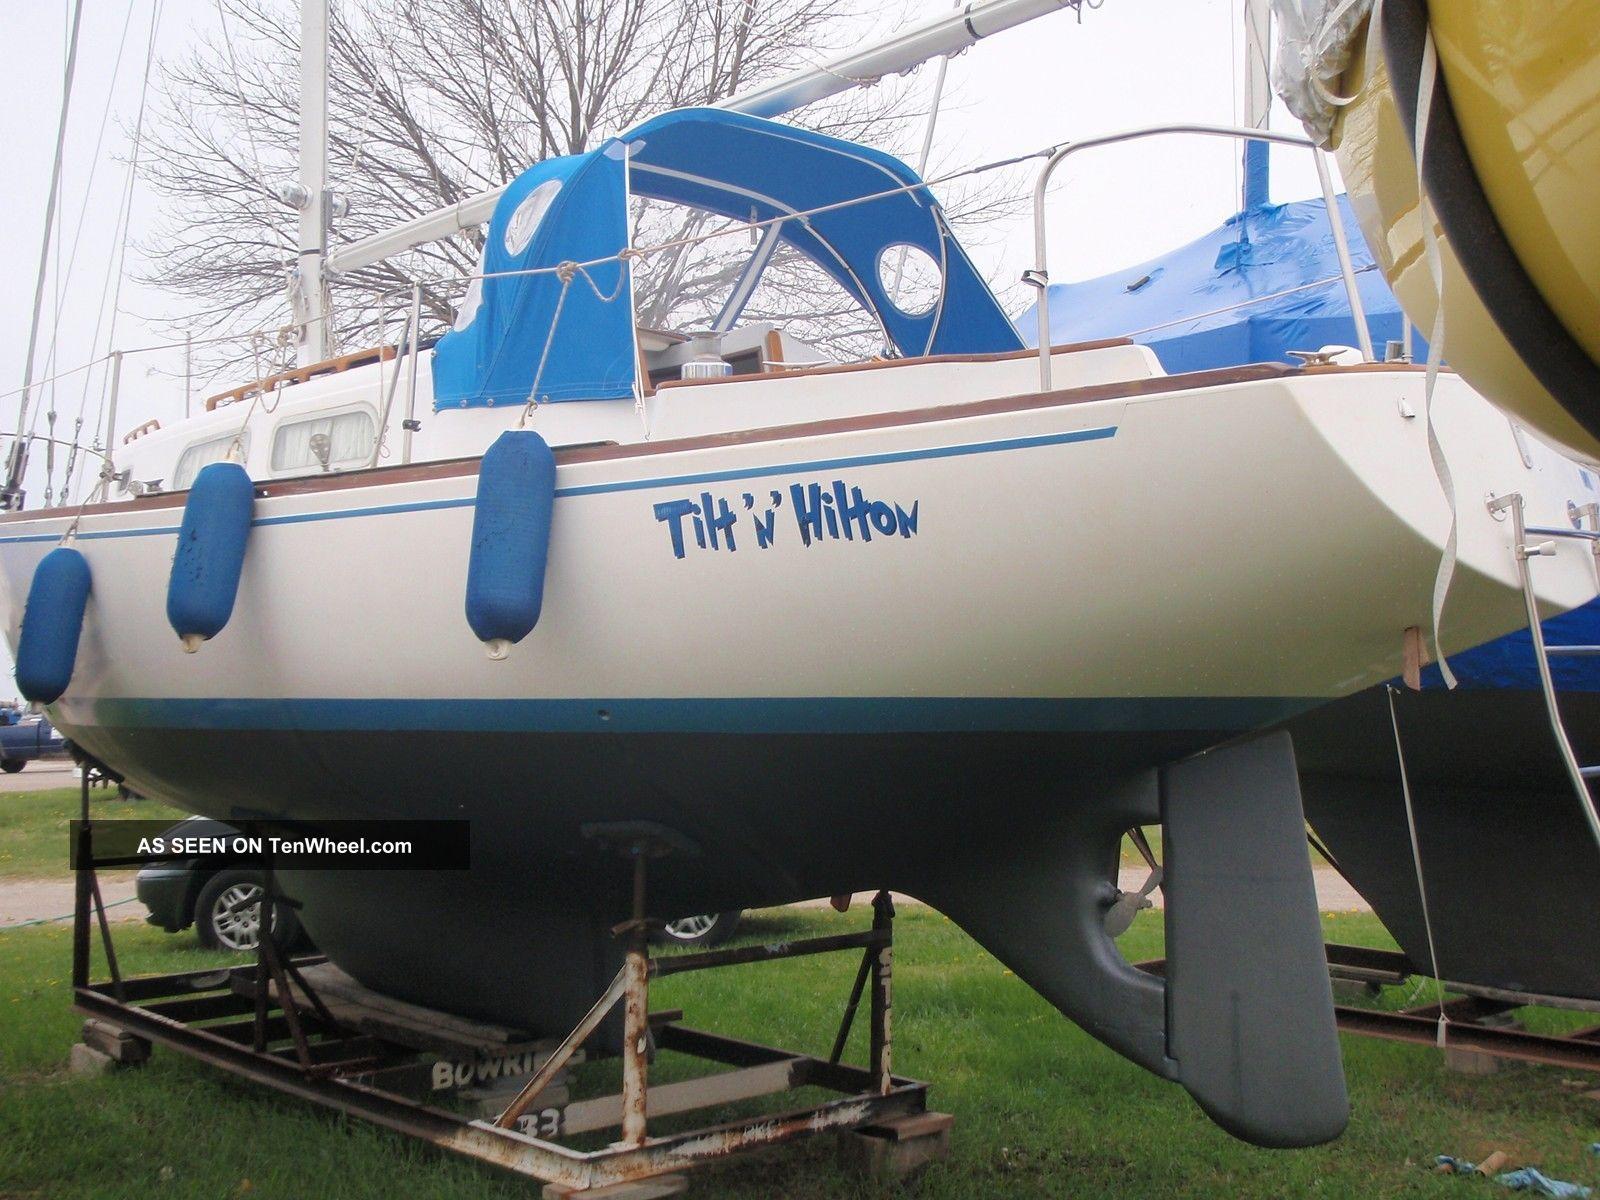 1972 Pearson 33 Sailboats 28+ feet photo